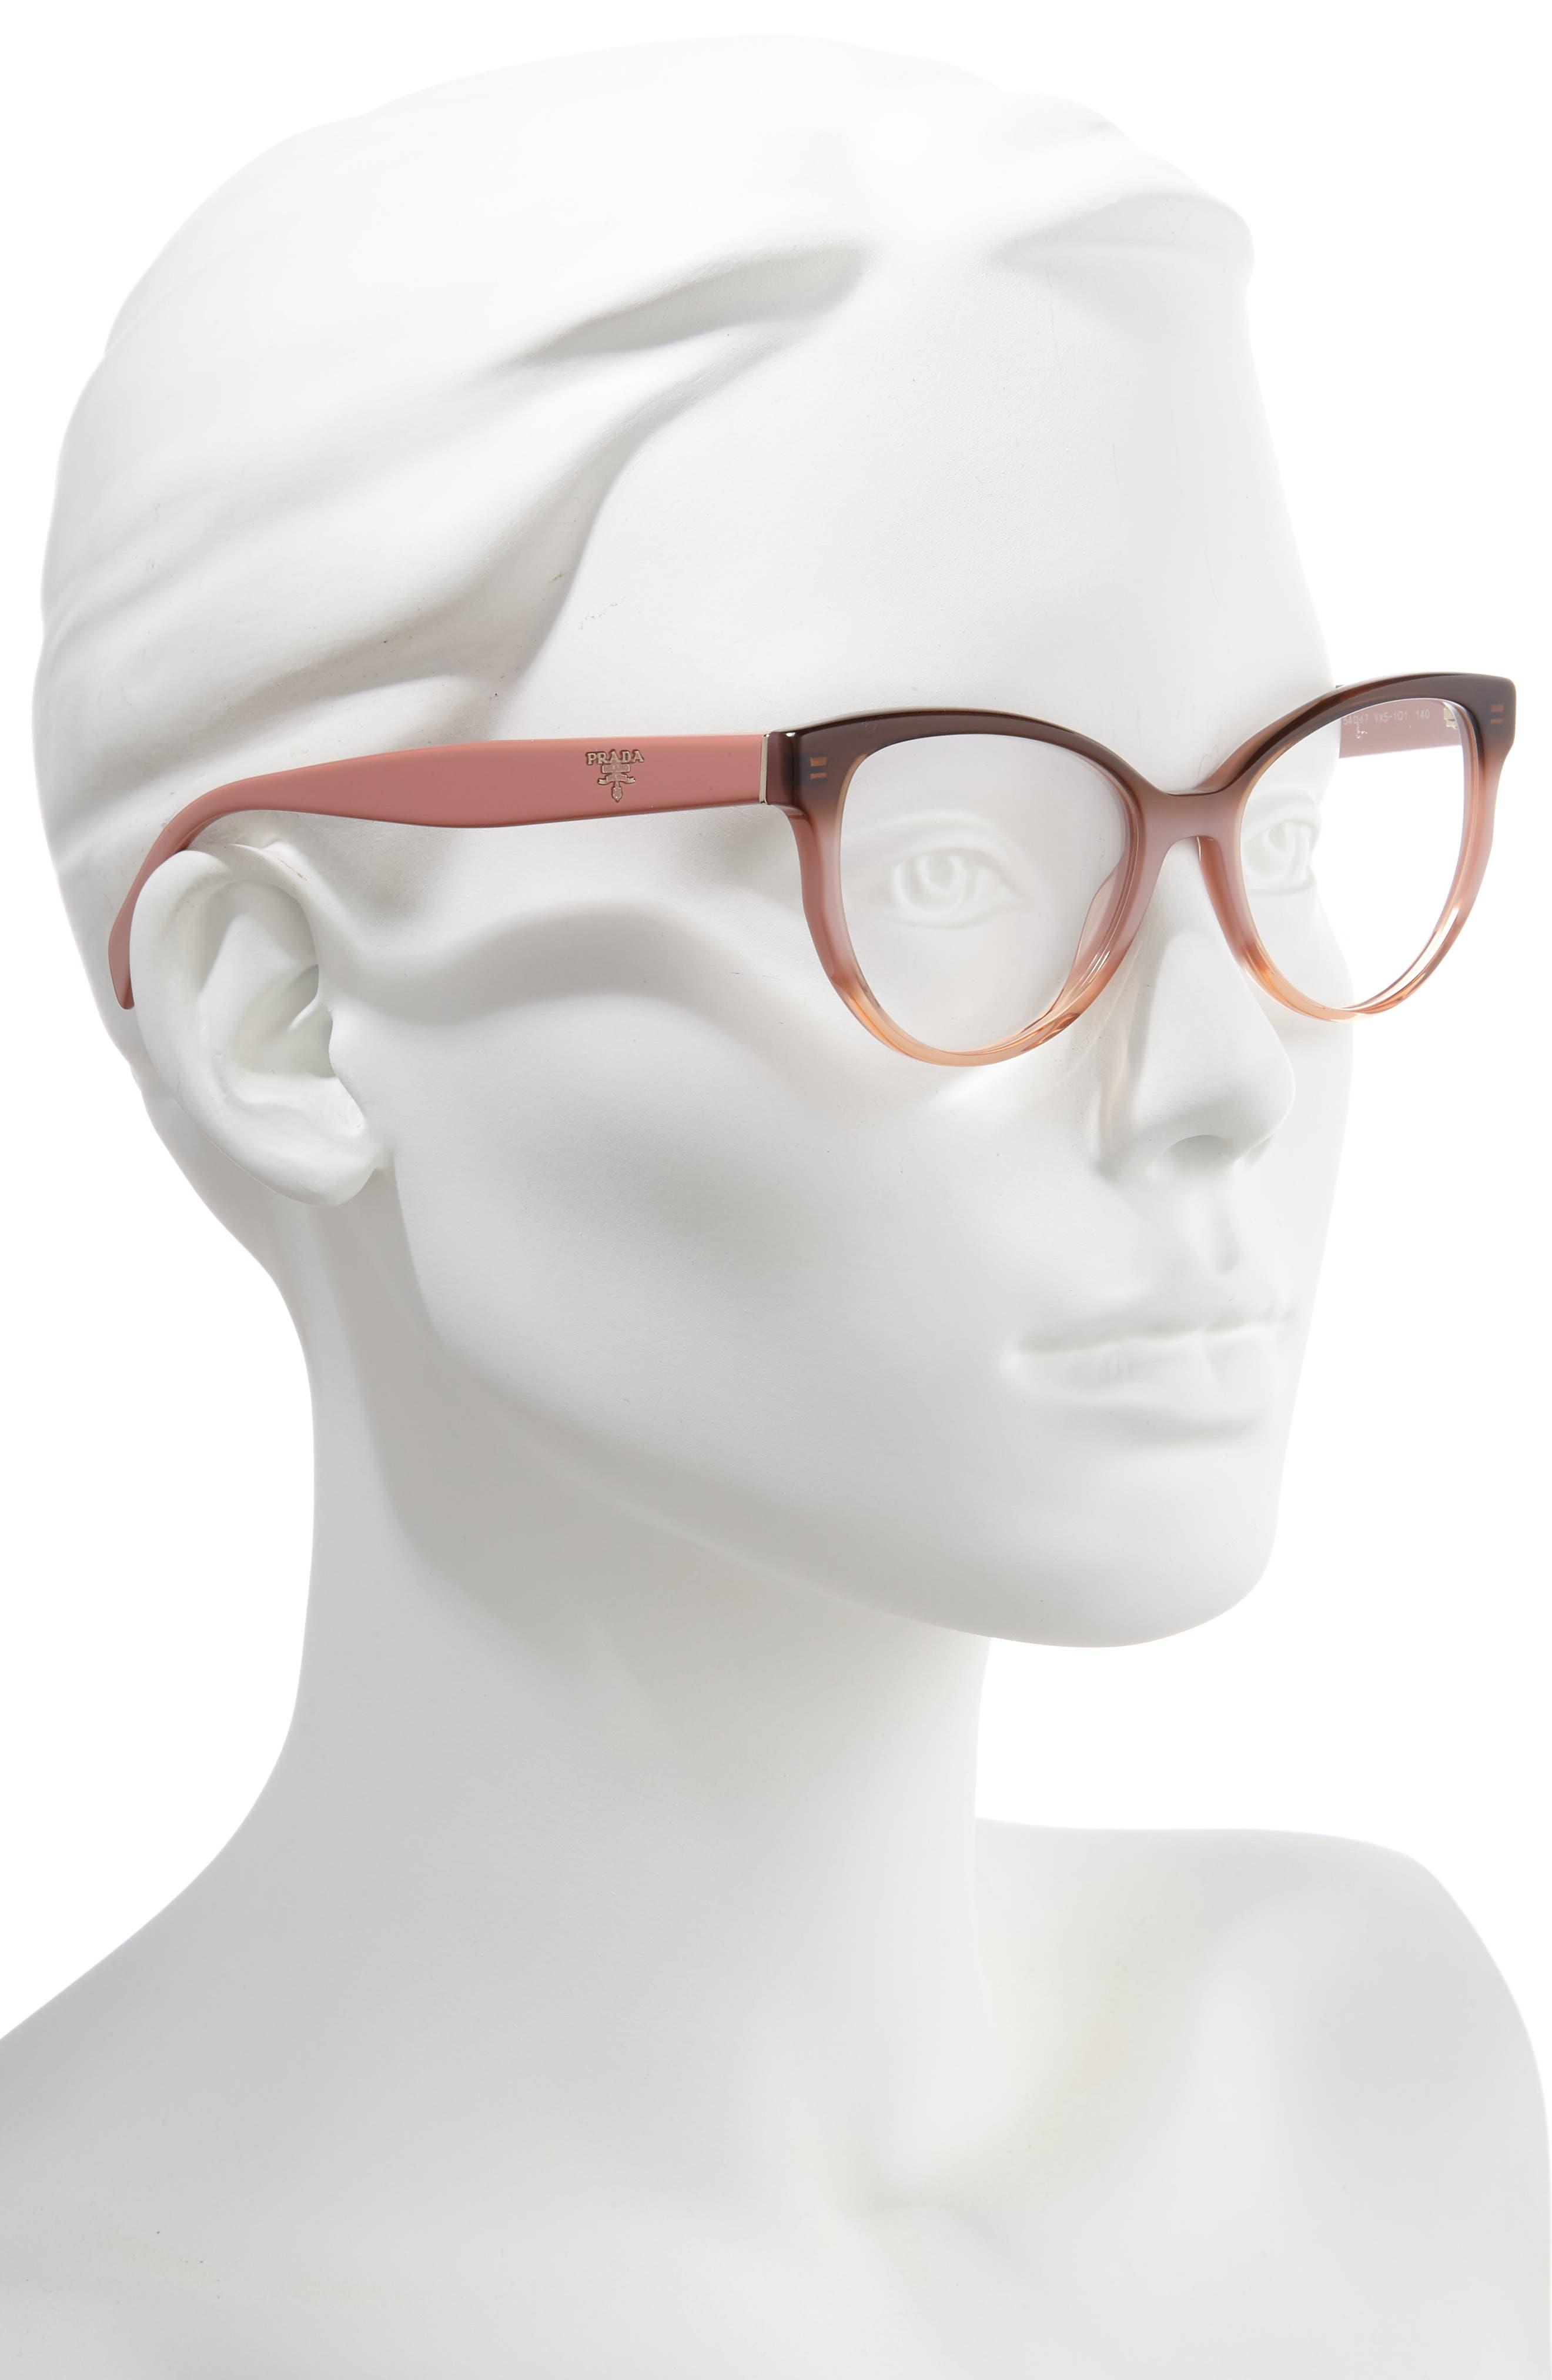 PRADA,                             54mm Cat Eye Optical Glasses,                             Alternate thumbnail 2, color,                             200